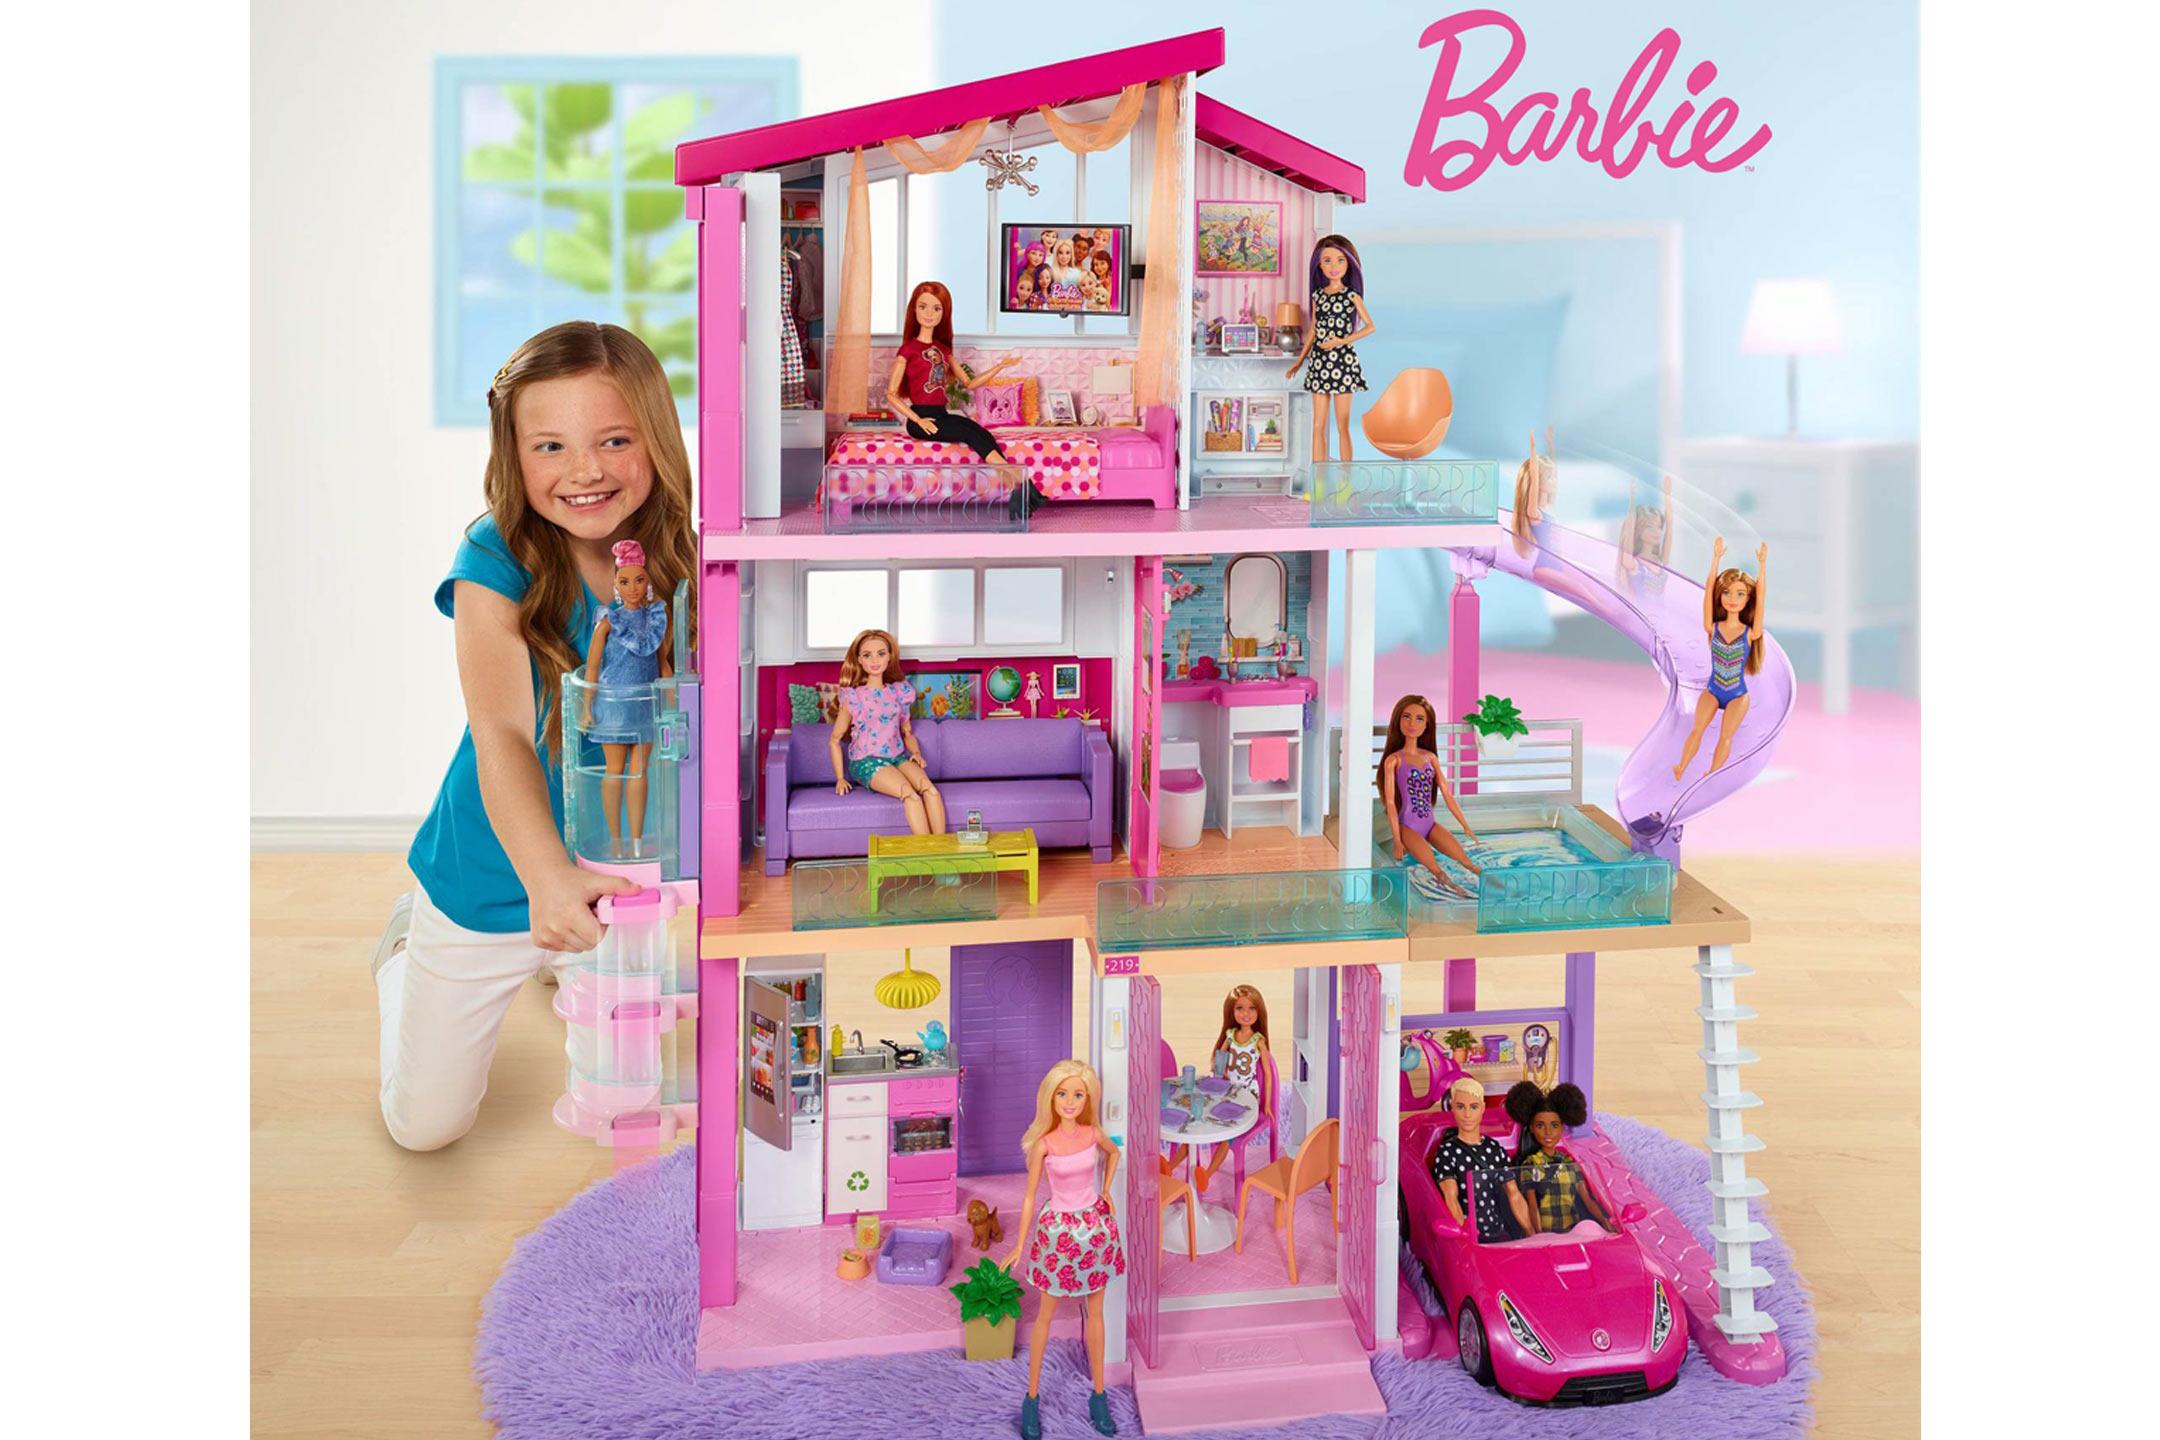 barbie-dream-house2160